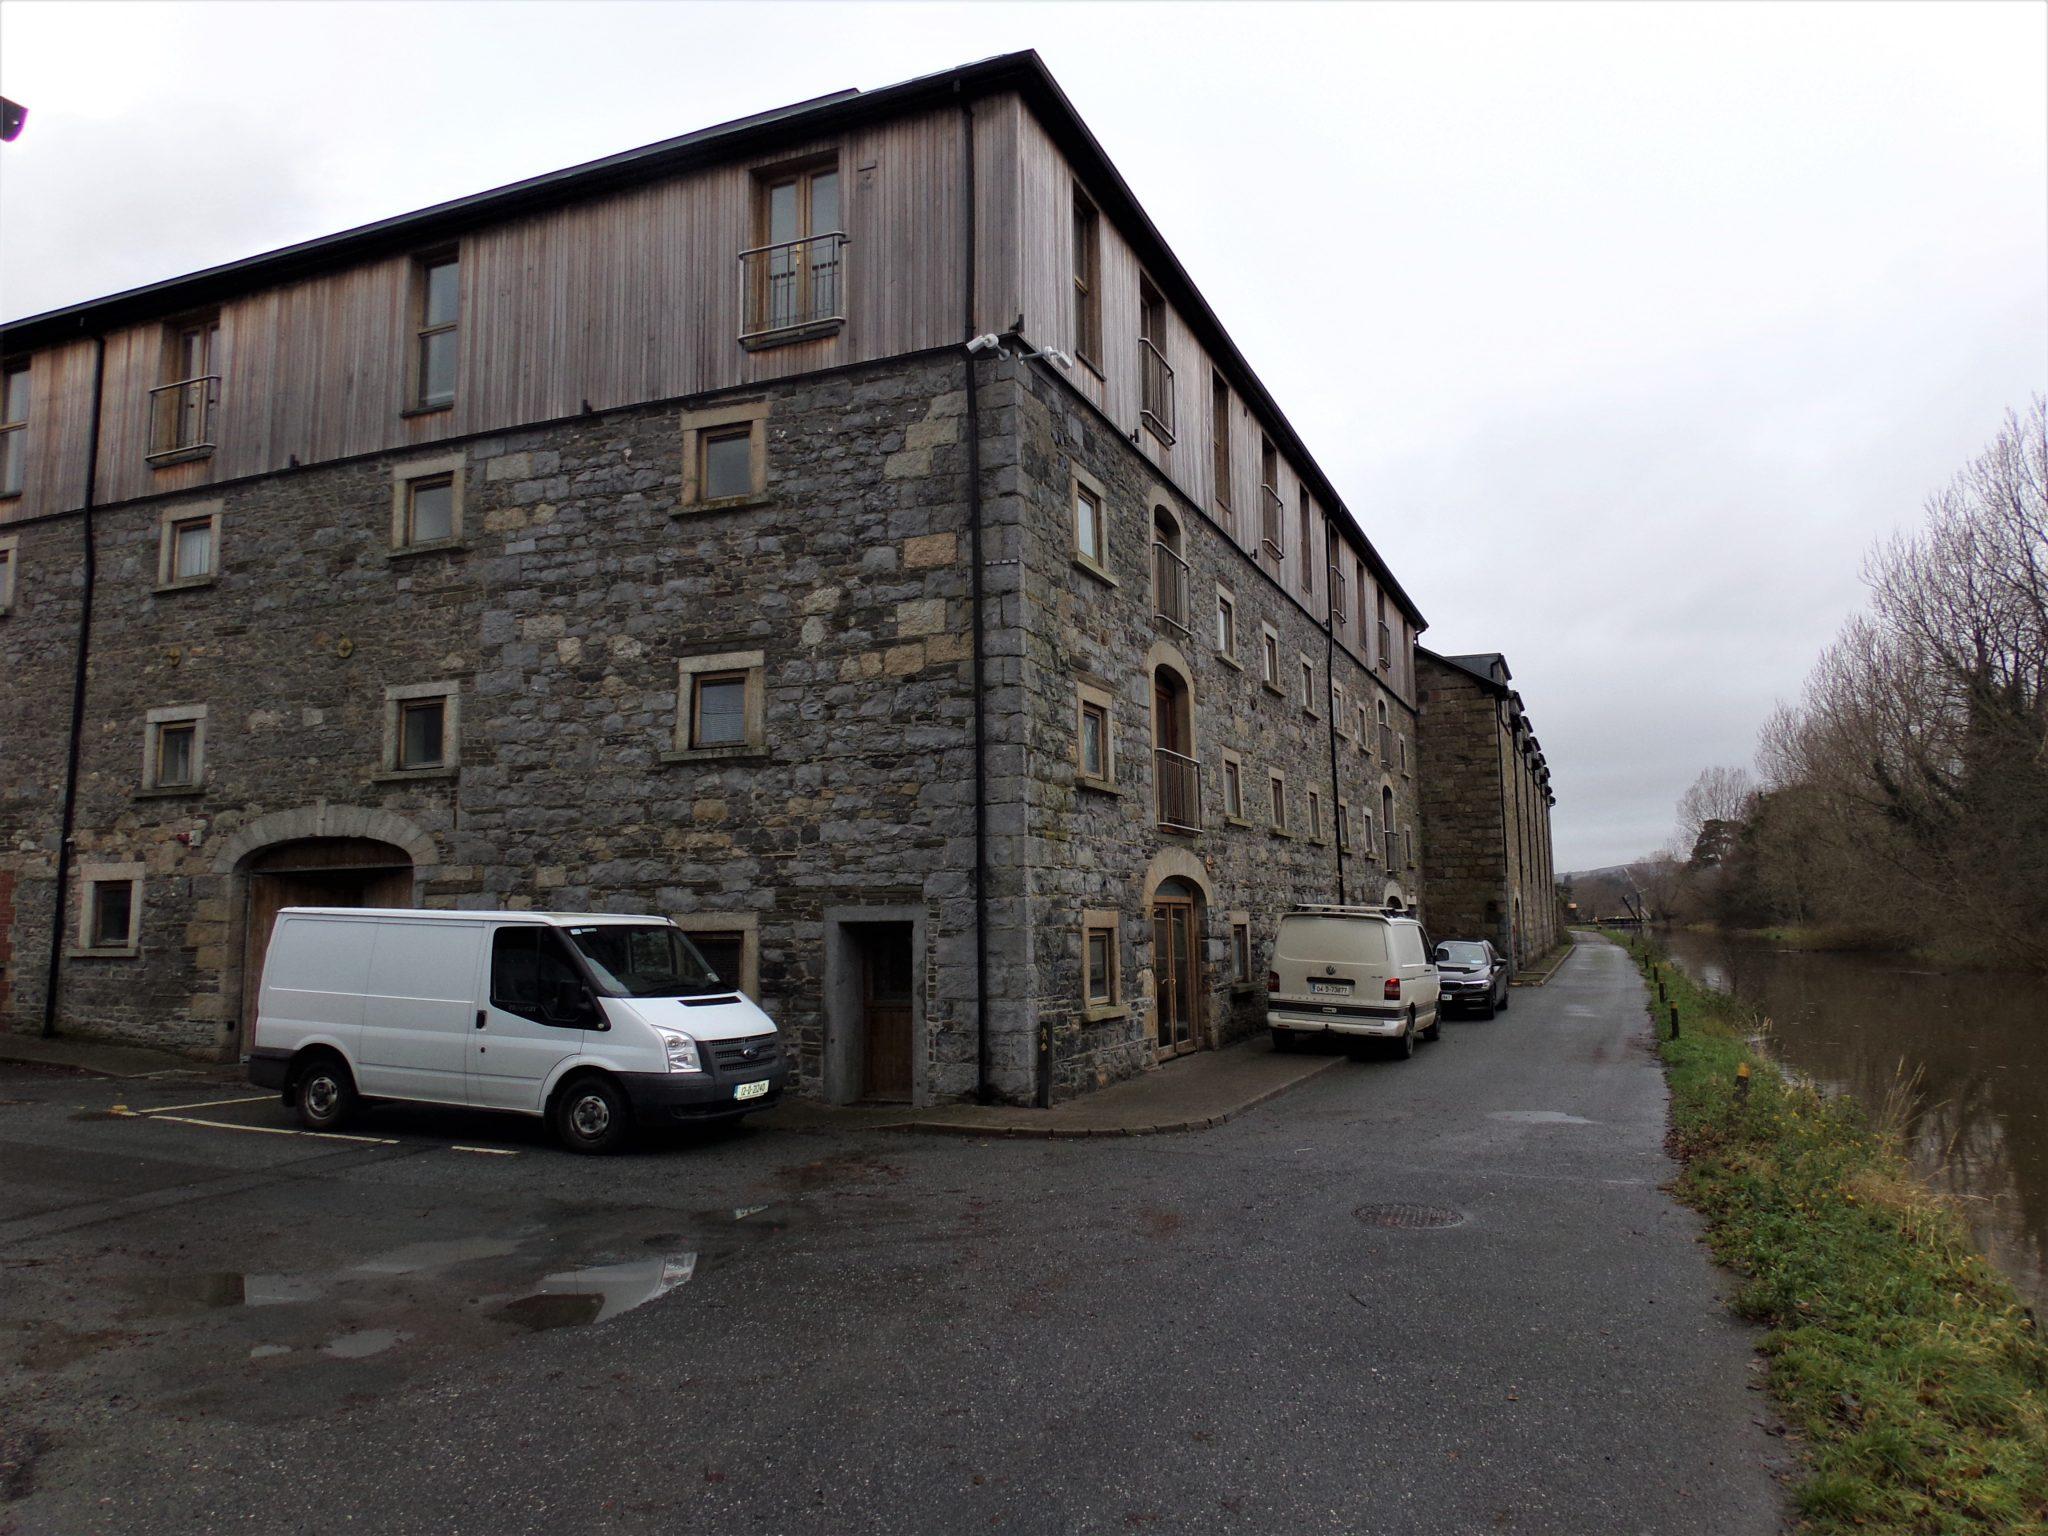 The Grainstore, Singletons Lane, Bagenalstown, Co. Carlow